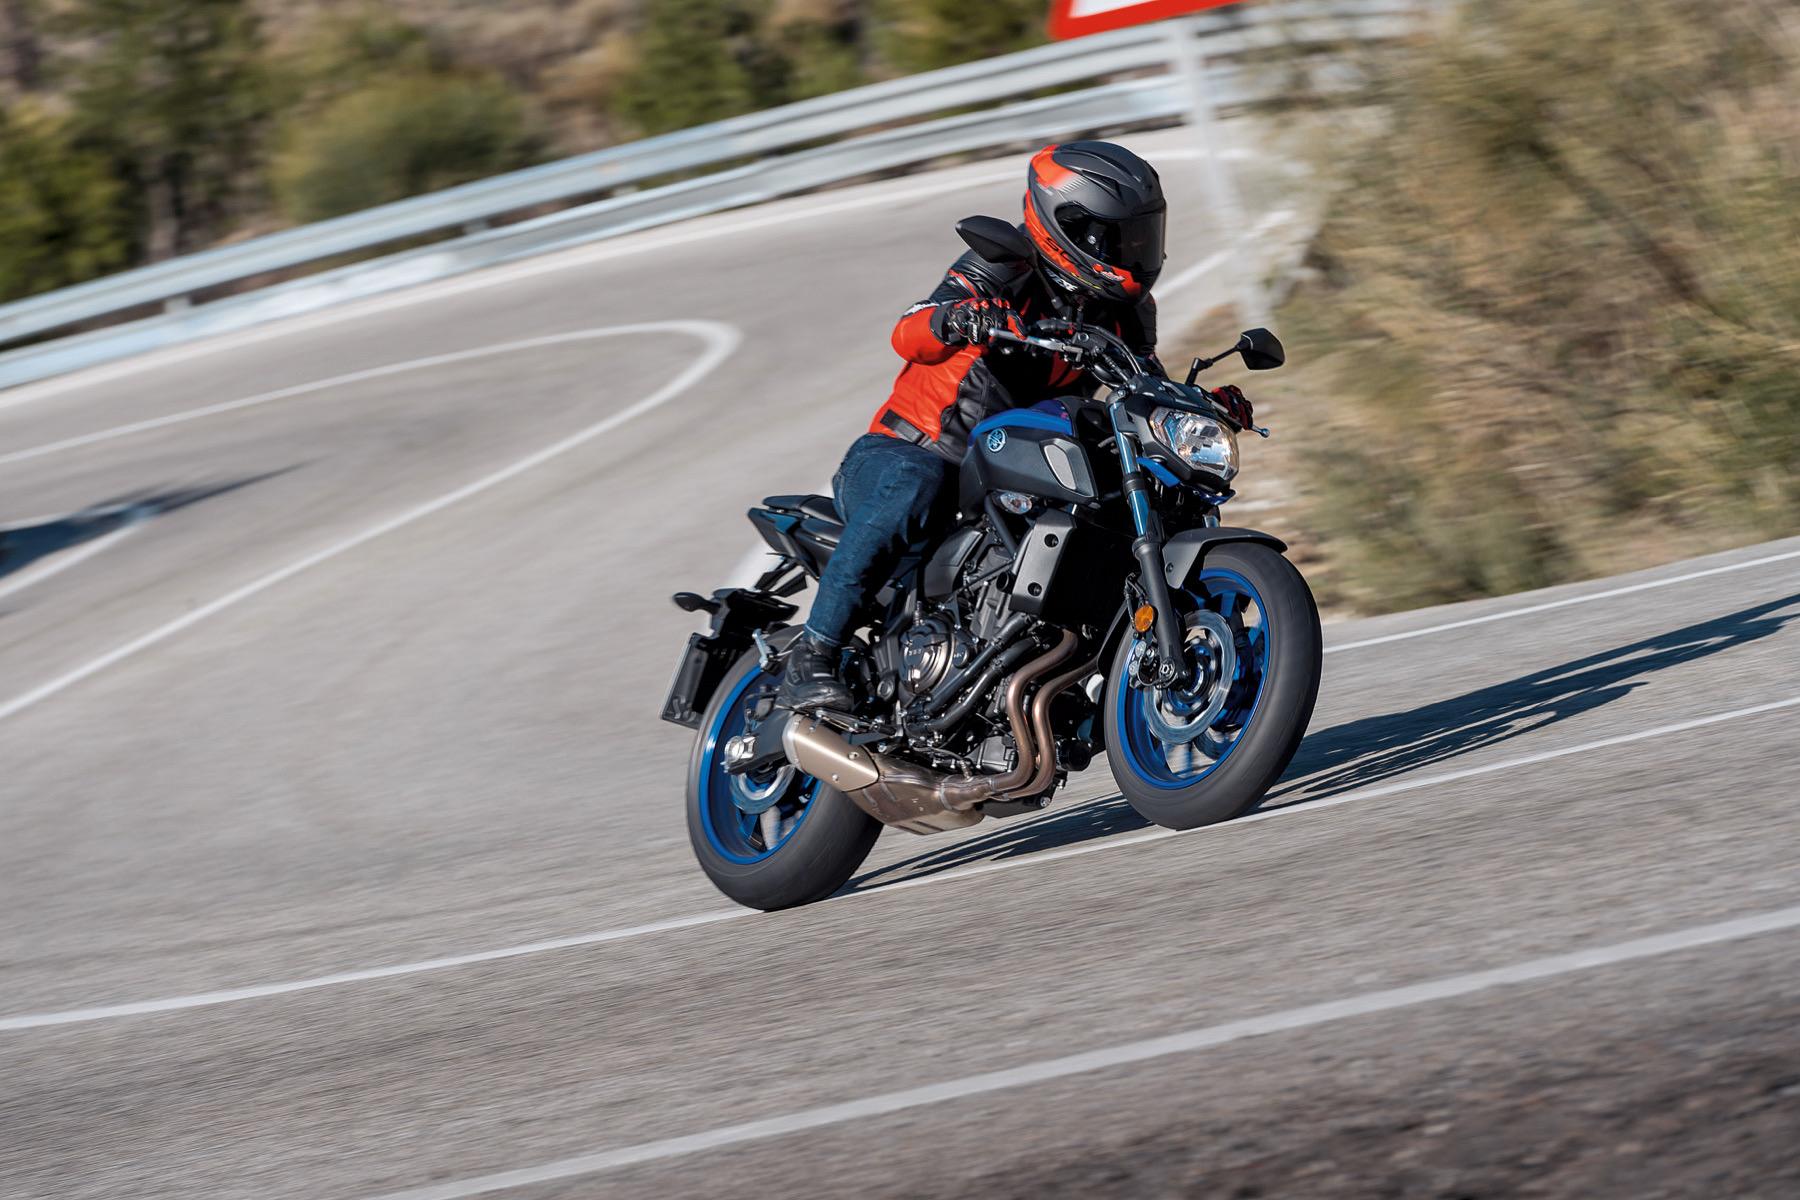 Probamos la Yamaha MT-07 2018